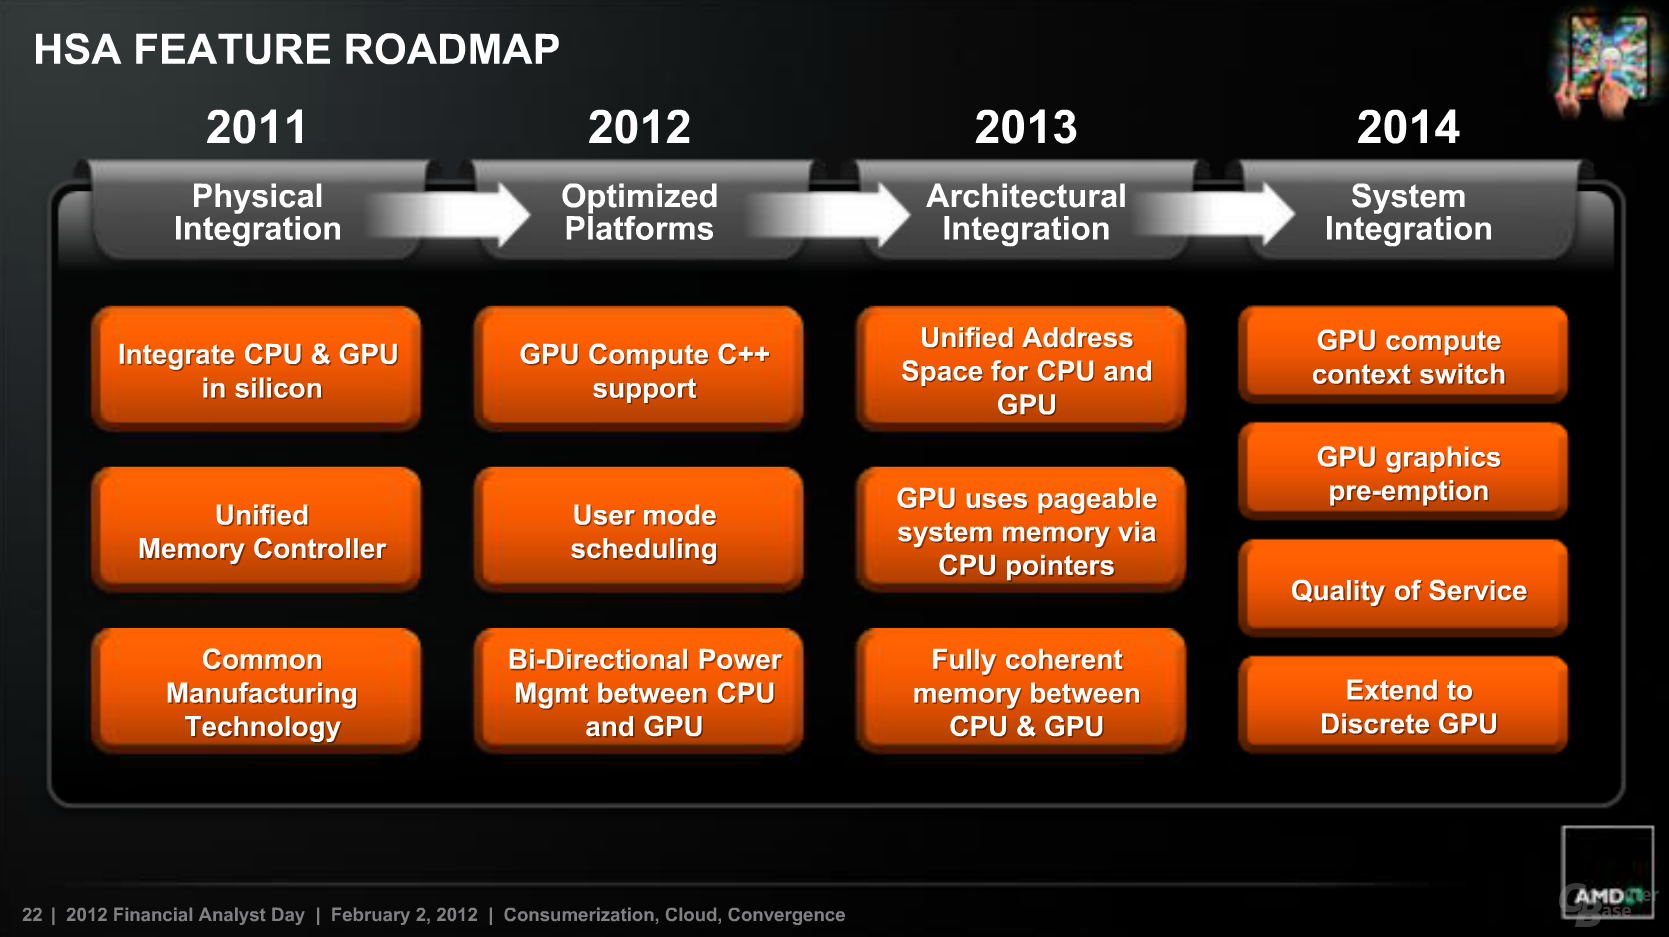 HSA Feature Roadmap